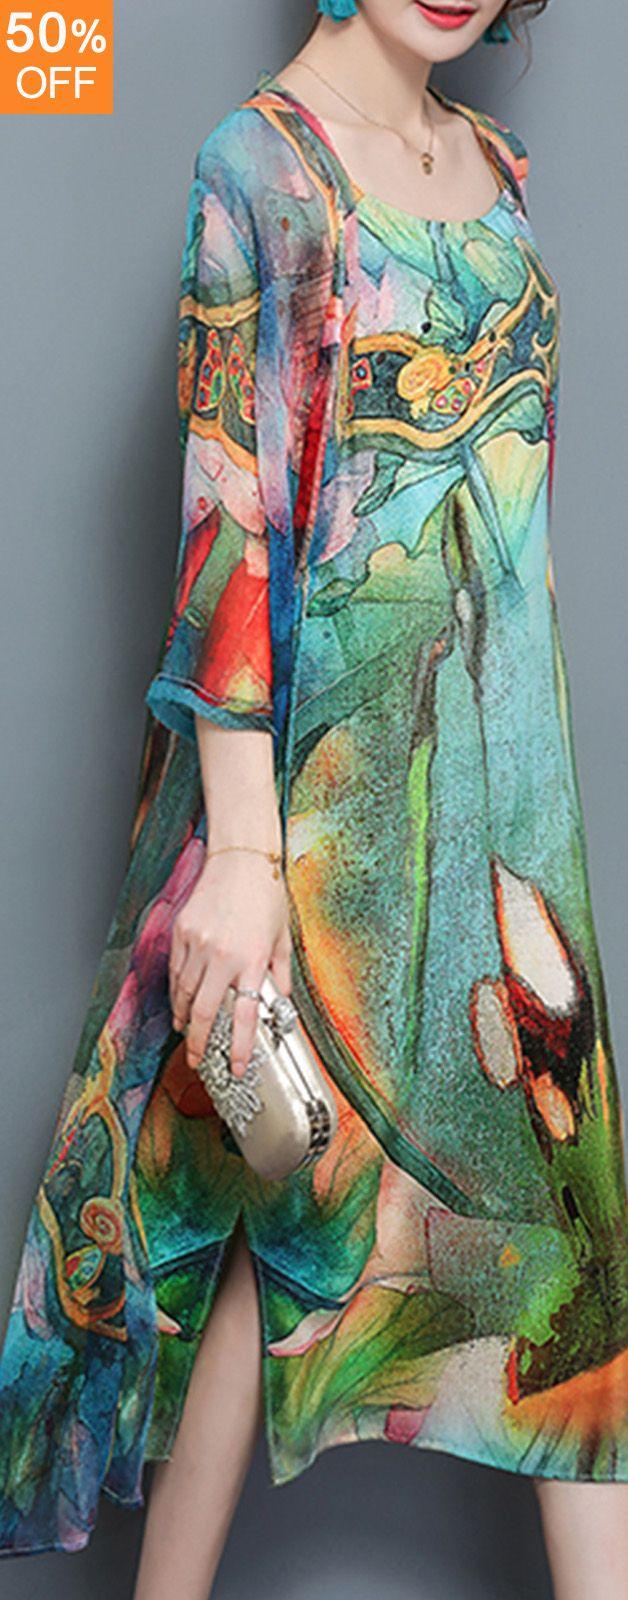 Vintage Dresses,Floral Dresses,Maxi Dresses,Work Dresses,Lace Dresses,Chiffon Dresses,Casual Dresses,Party Dresses,Sexy Dresses.